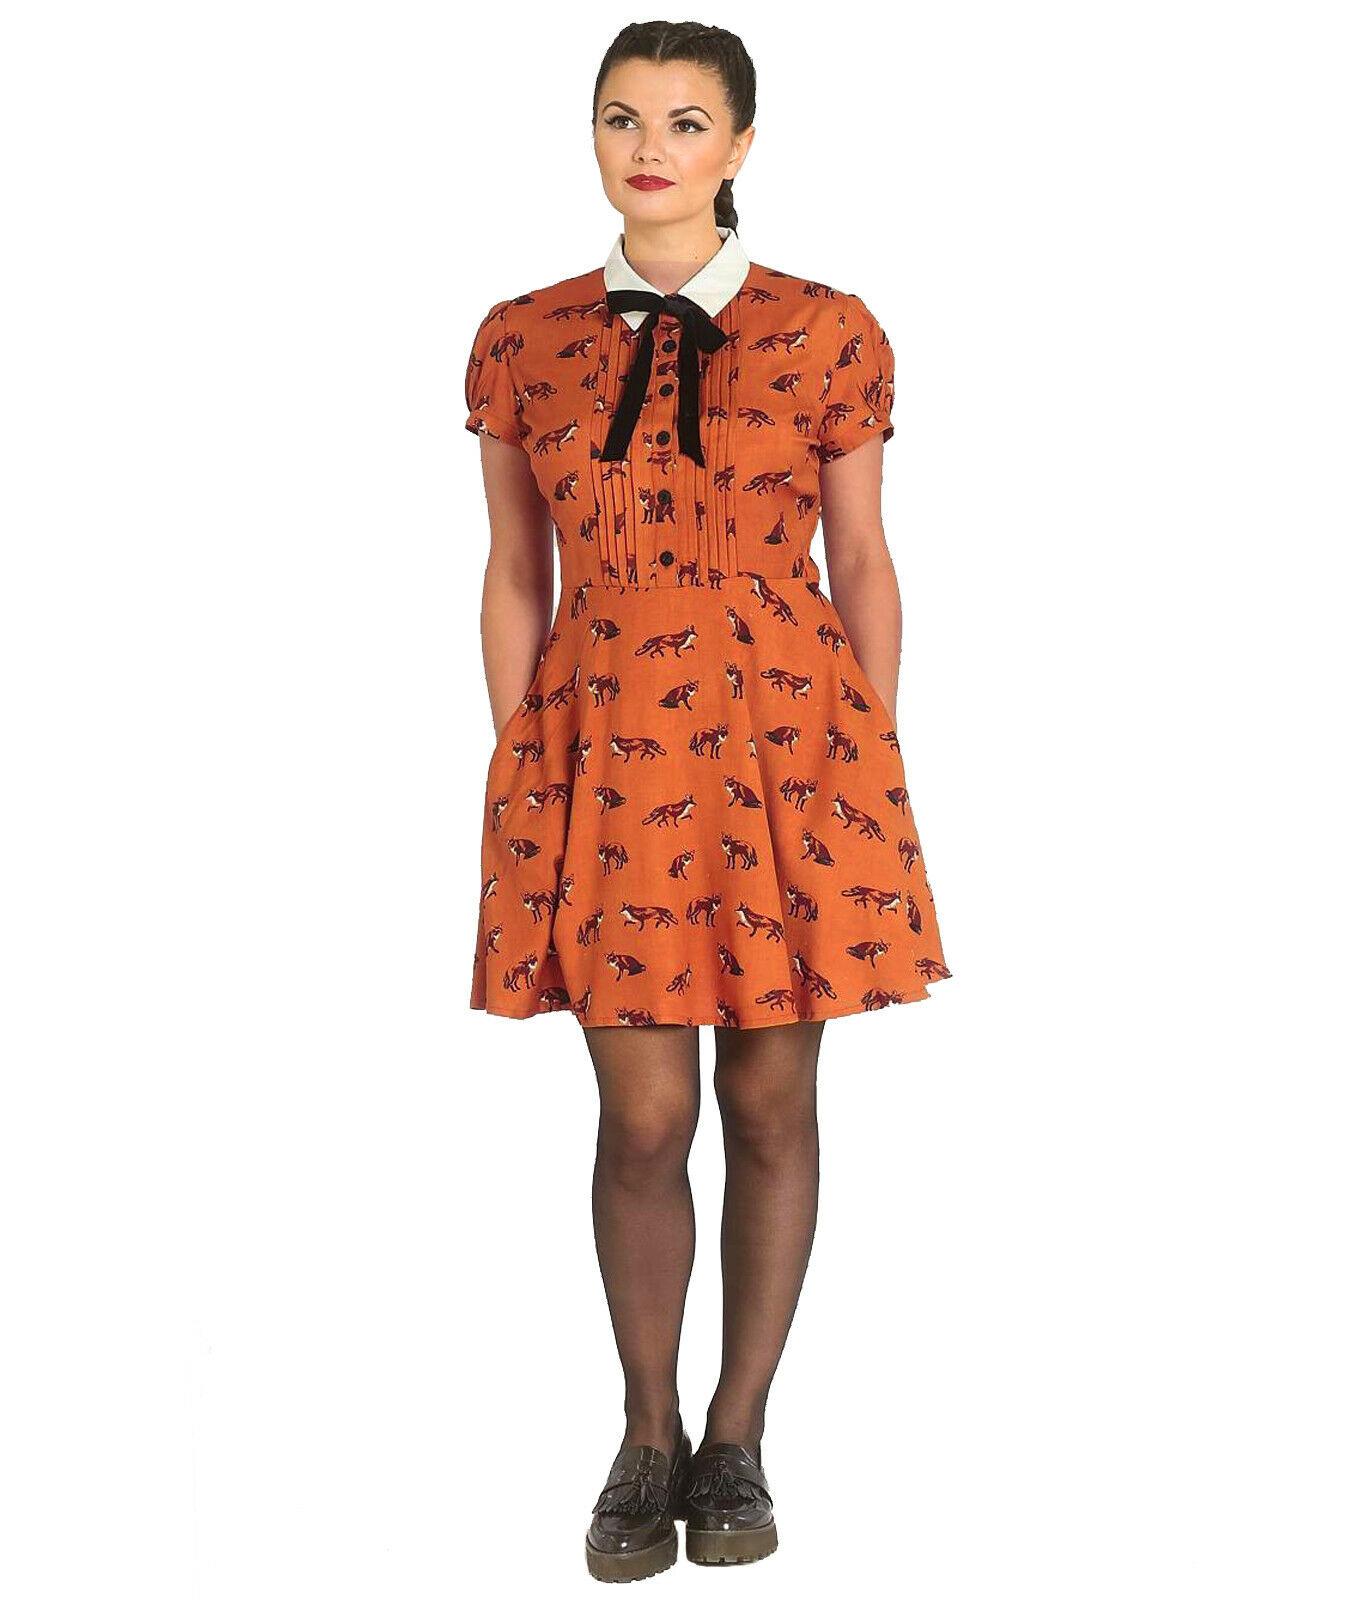 Hell-Bunny-40s-50s-Brown-Mini-Dress-Pin-Up-VIXEY-Vixen-Fox-Print-All-Sizes thumbnail 5